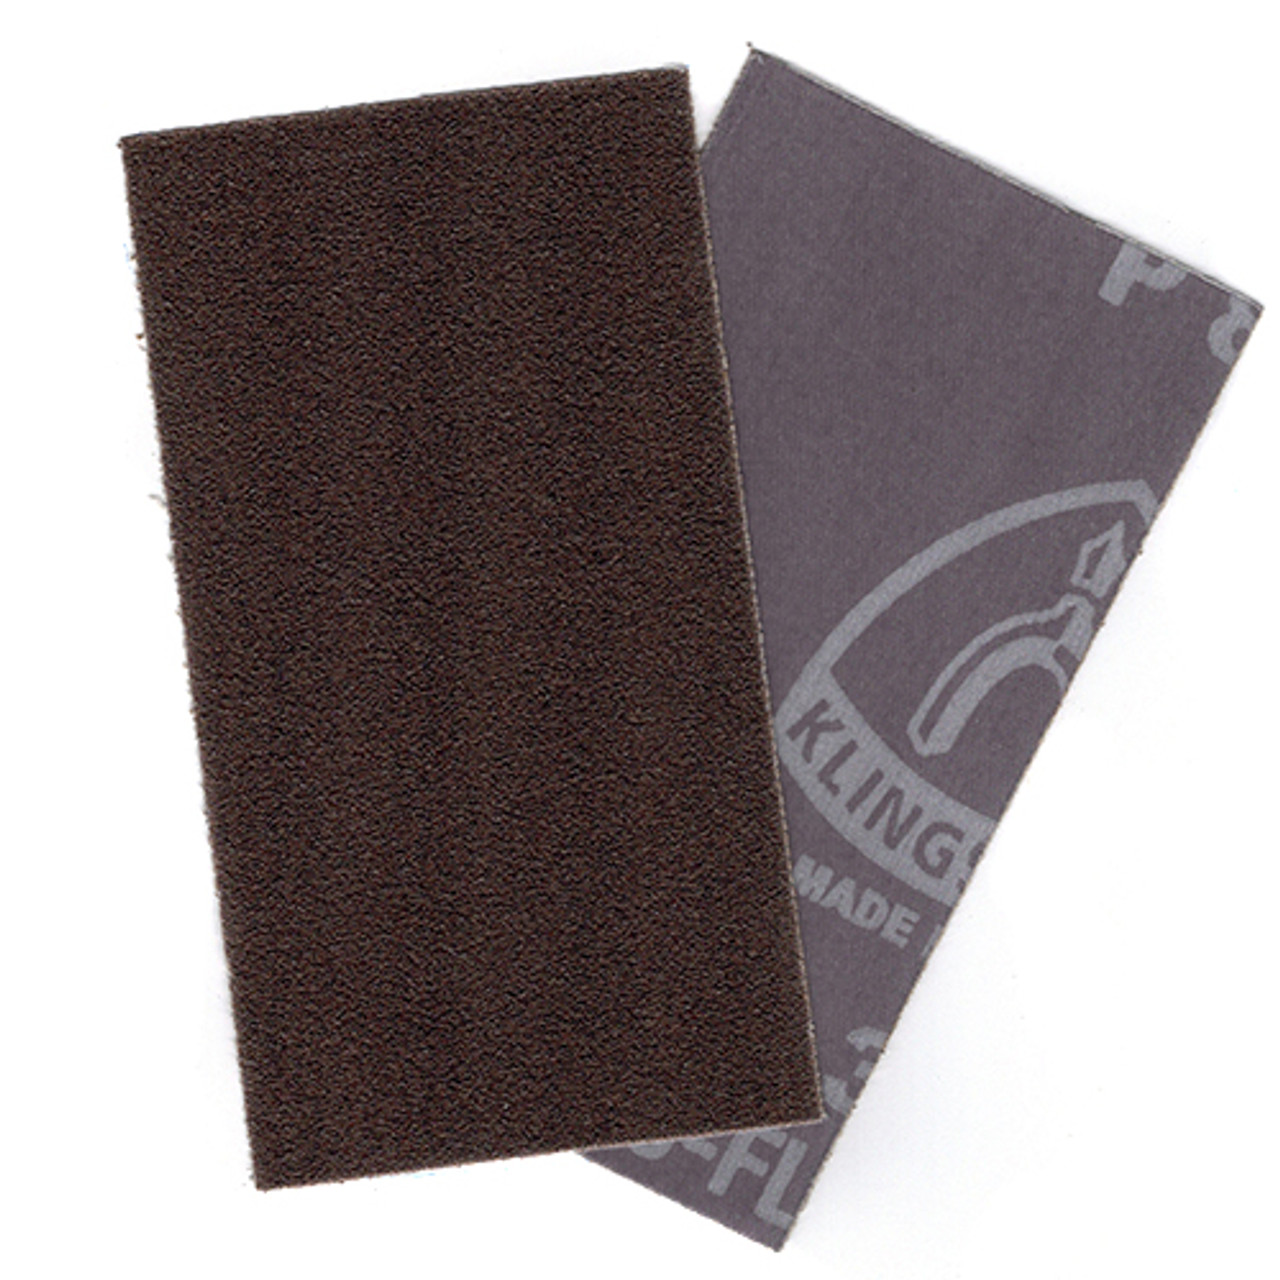 "Soft-Sanders 5"" Foam Profile Sanders, Adhesive Backed Abrasive Sheets 80 Grit 10pk"